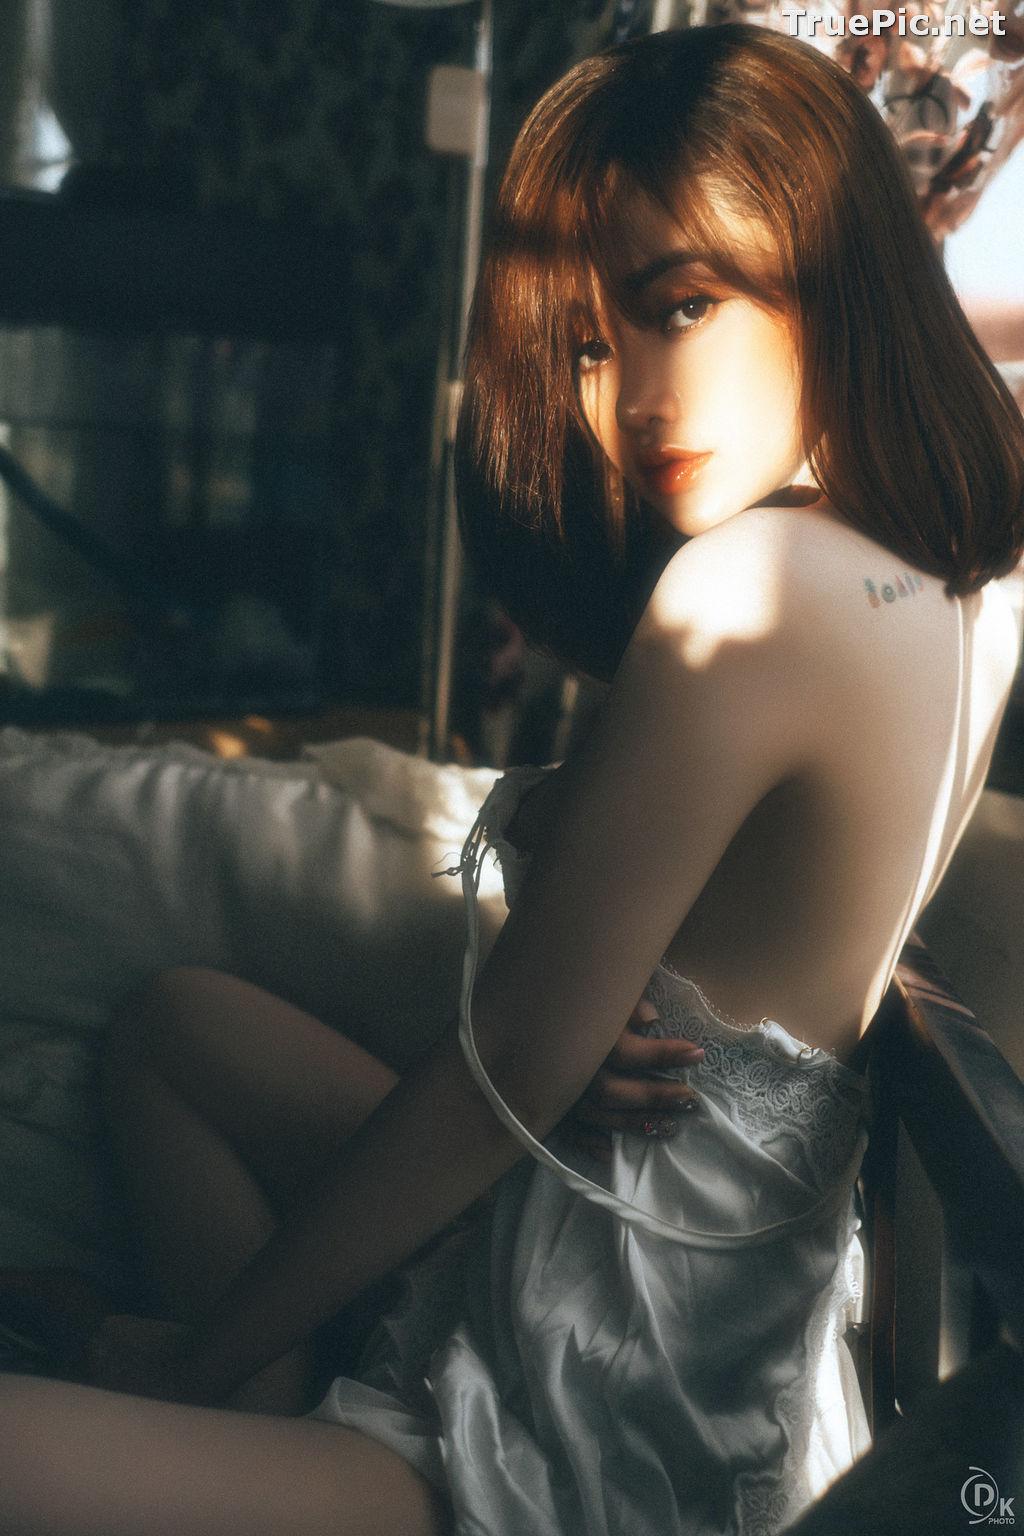 Image Vietnamese Hot Model - Sleepwear and Lingerie Under Dawnlight - TruePic.net - Picture-9